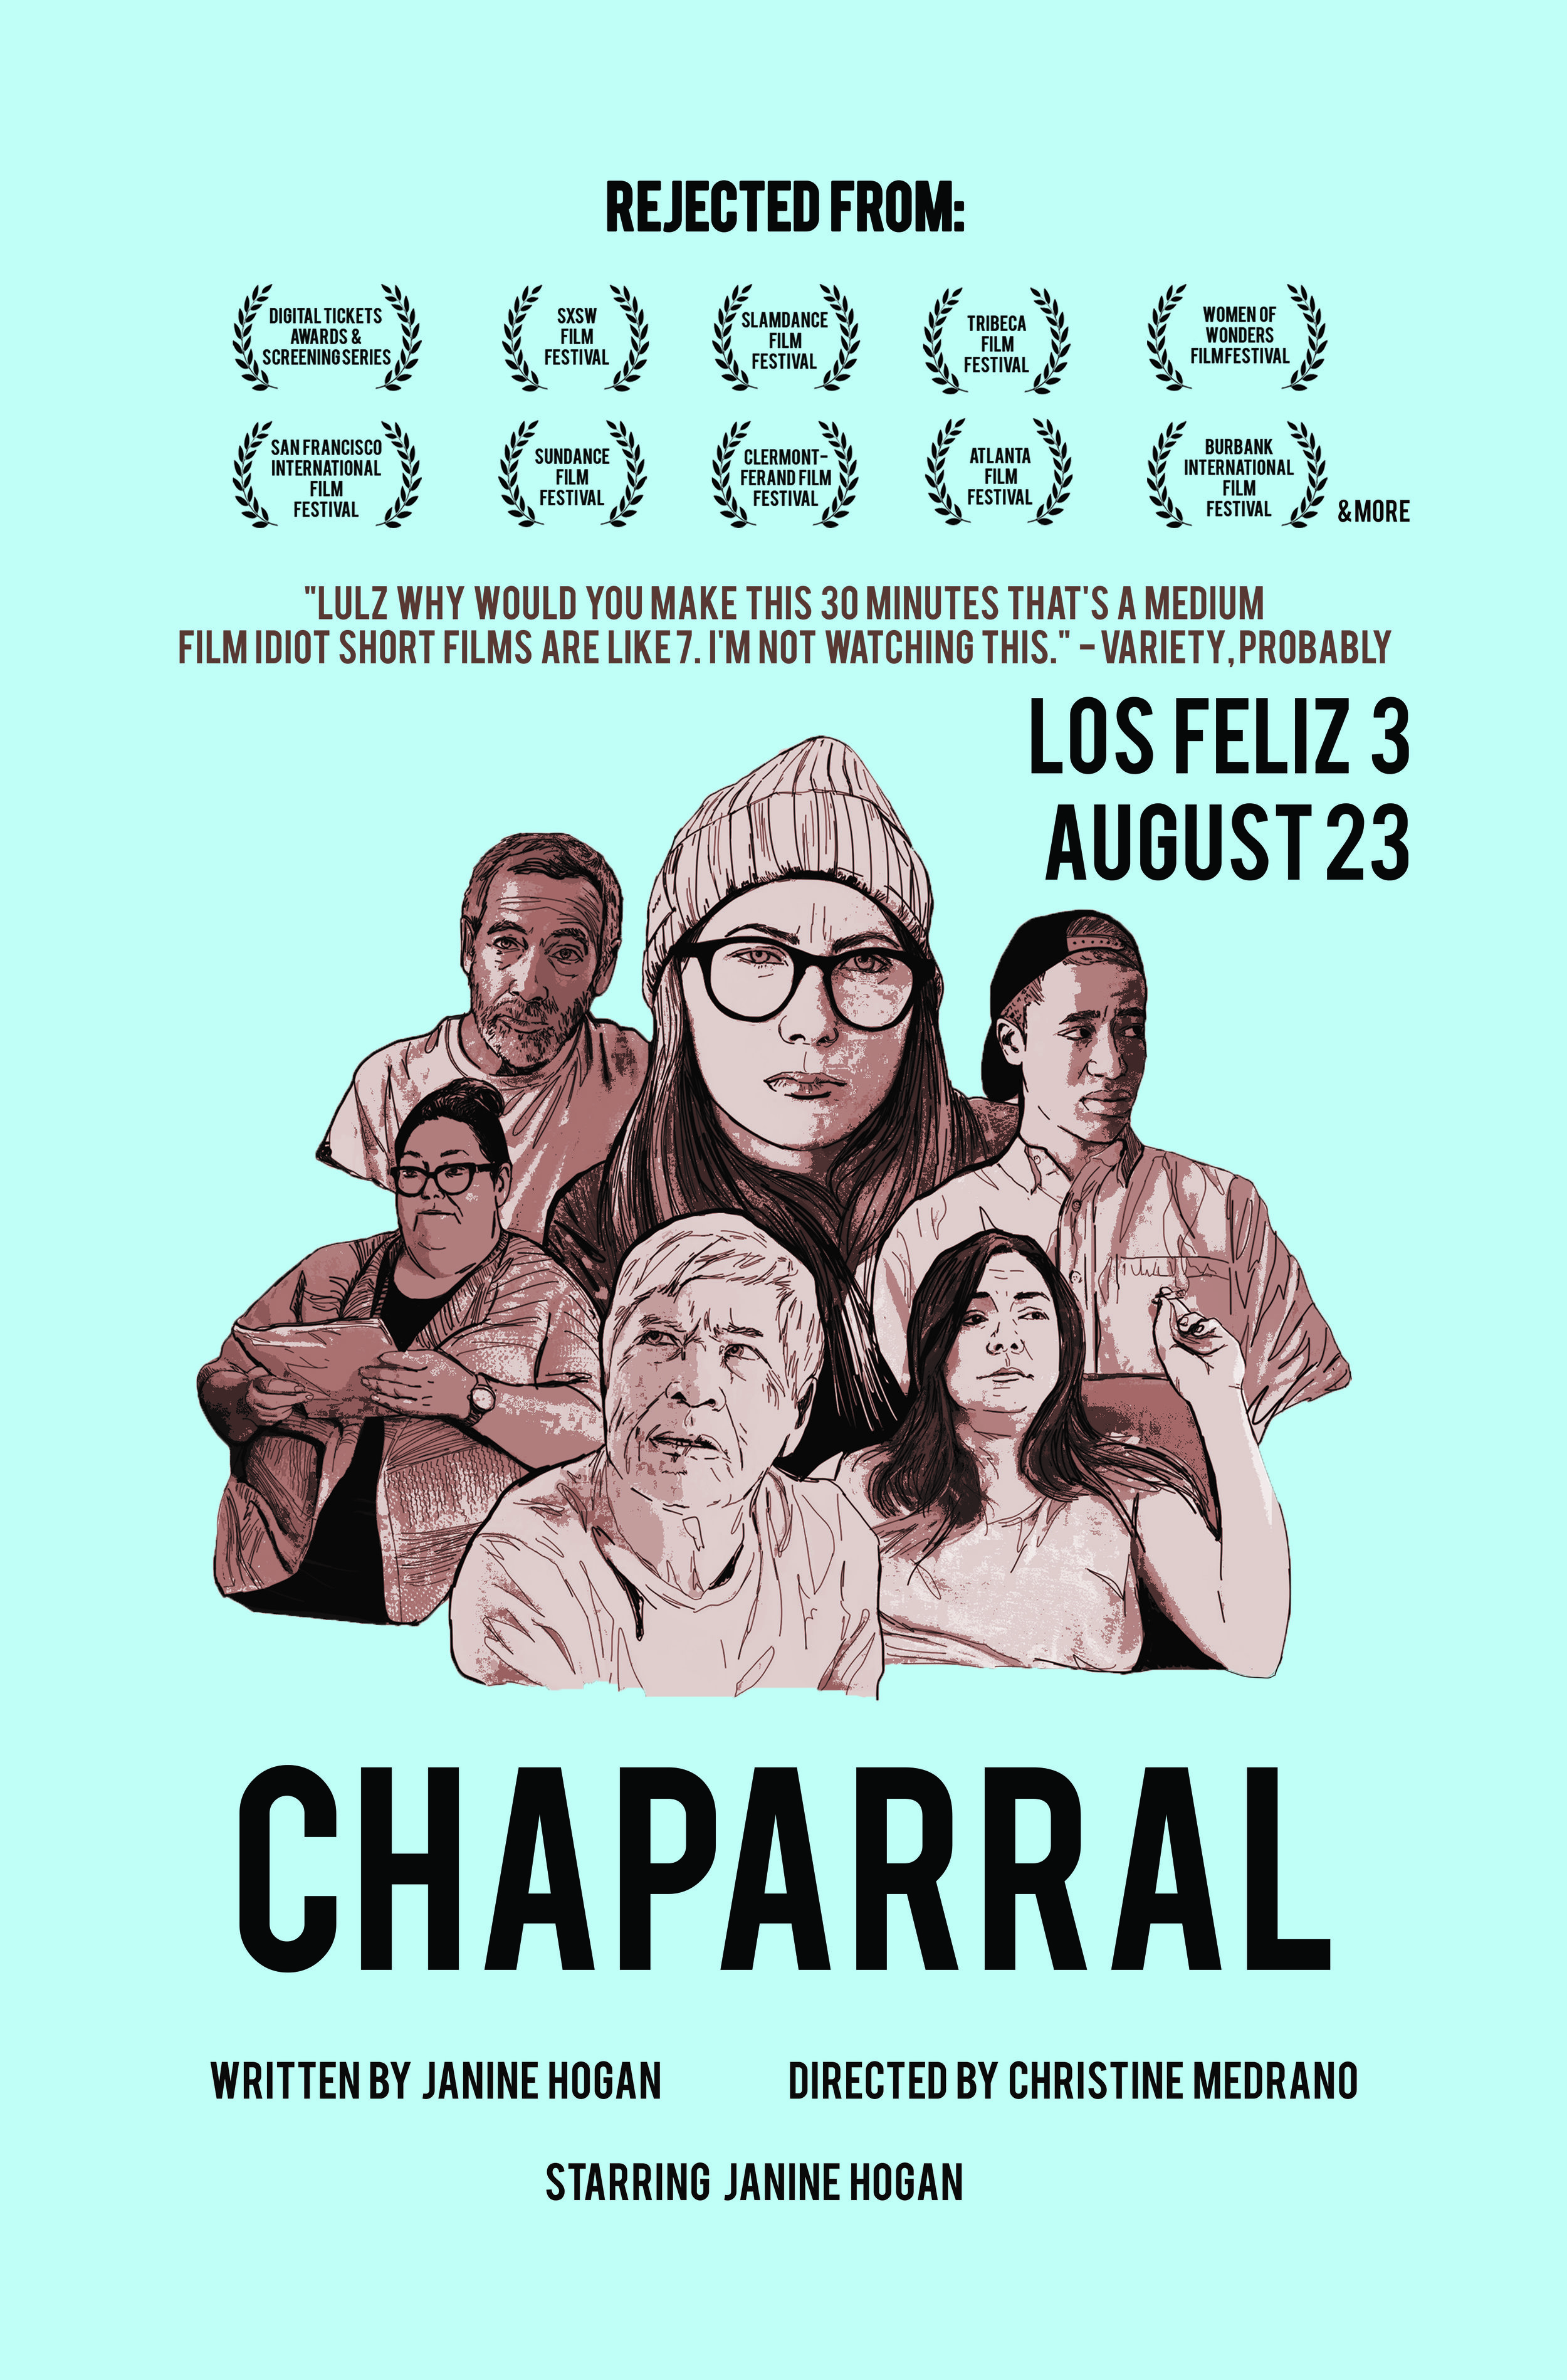 chaparral_LF3.jpg